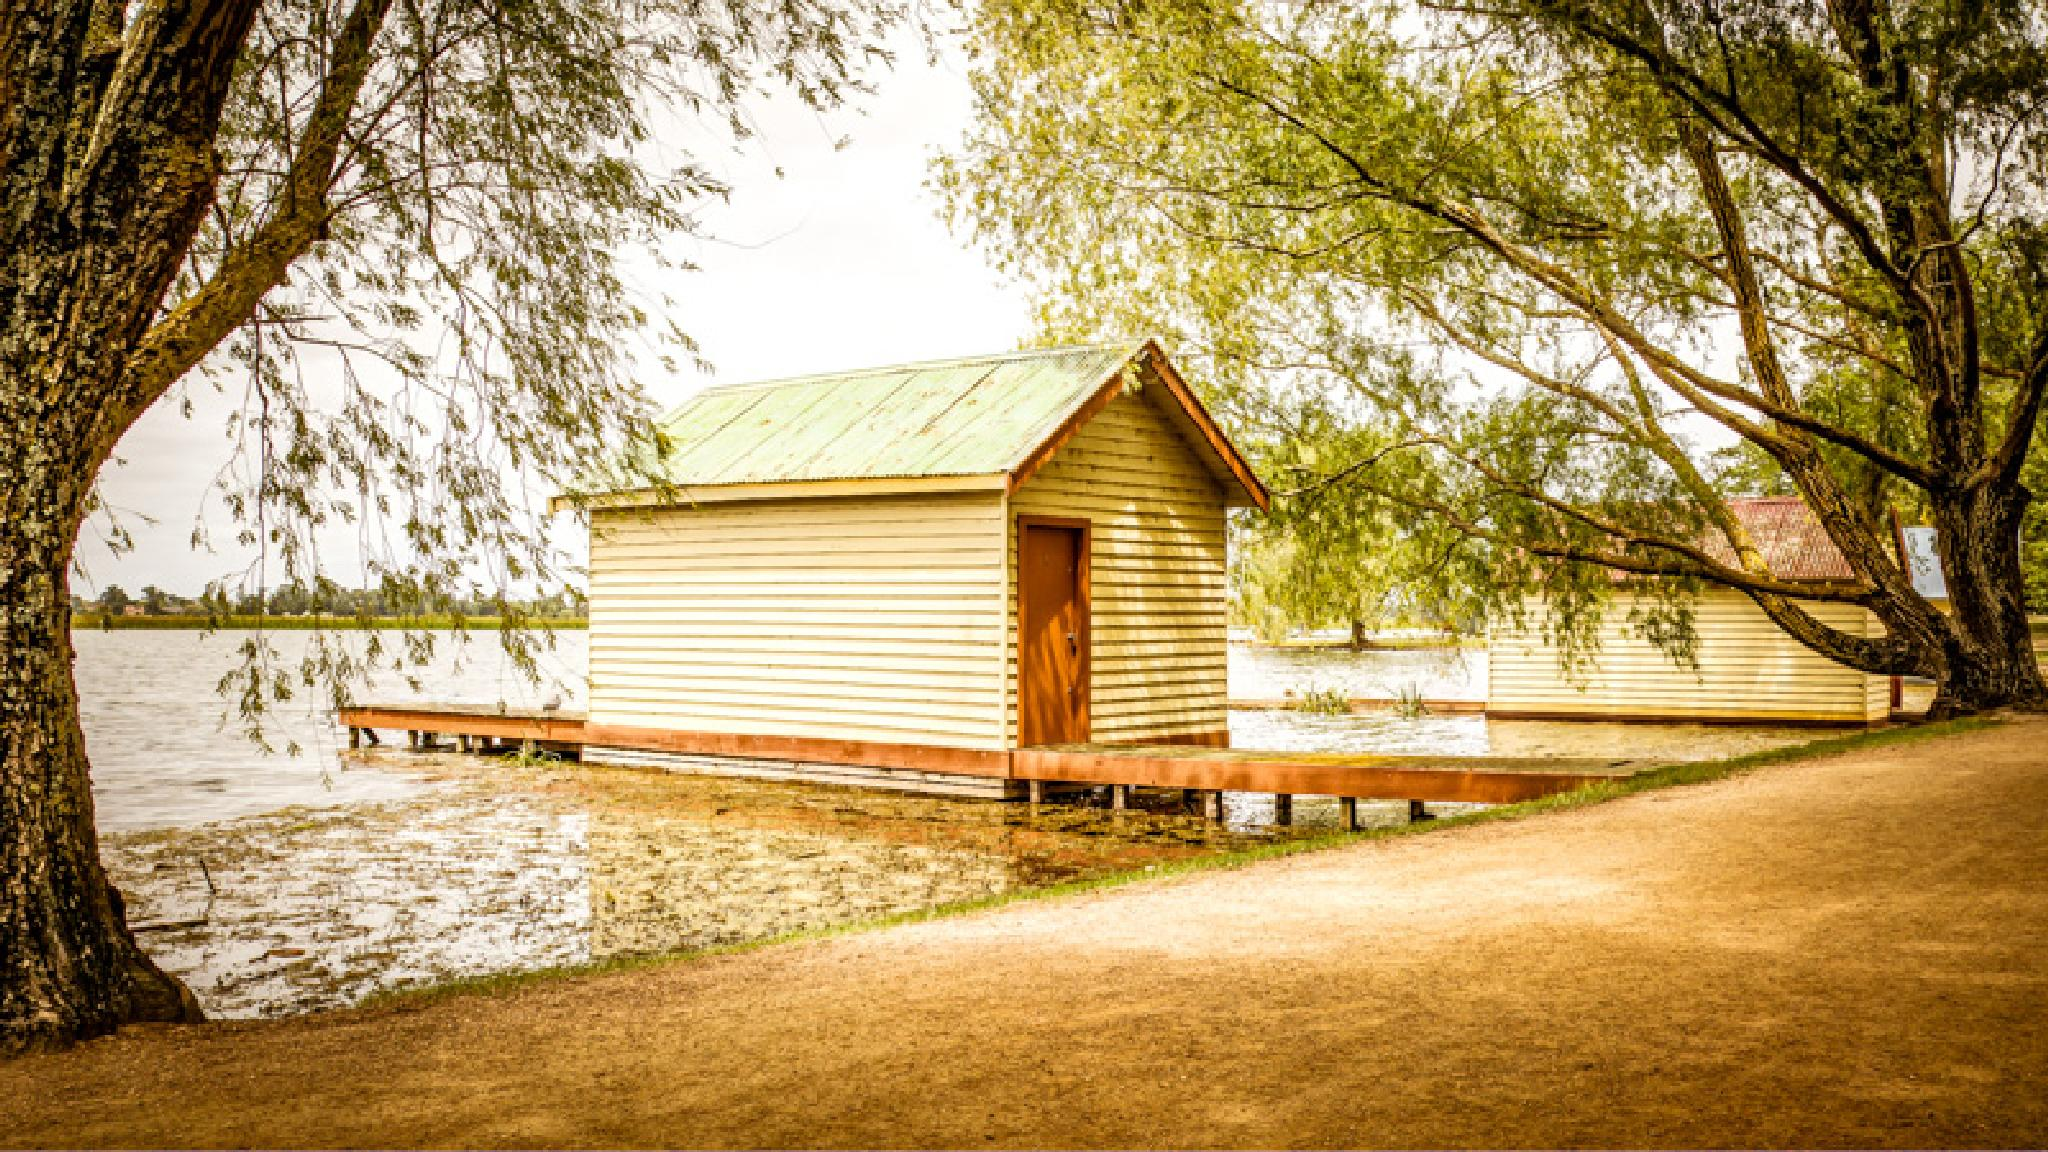 Boathouse by Tony Buckley Photography